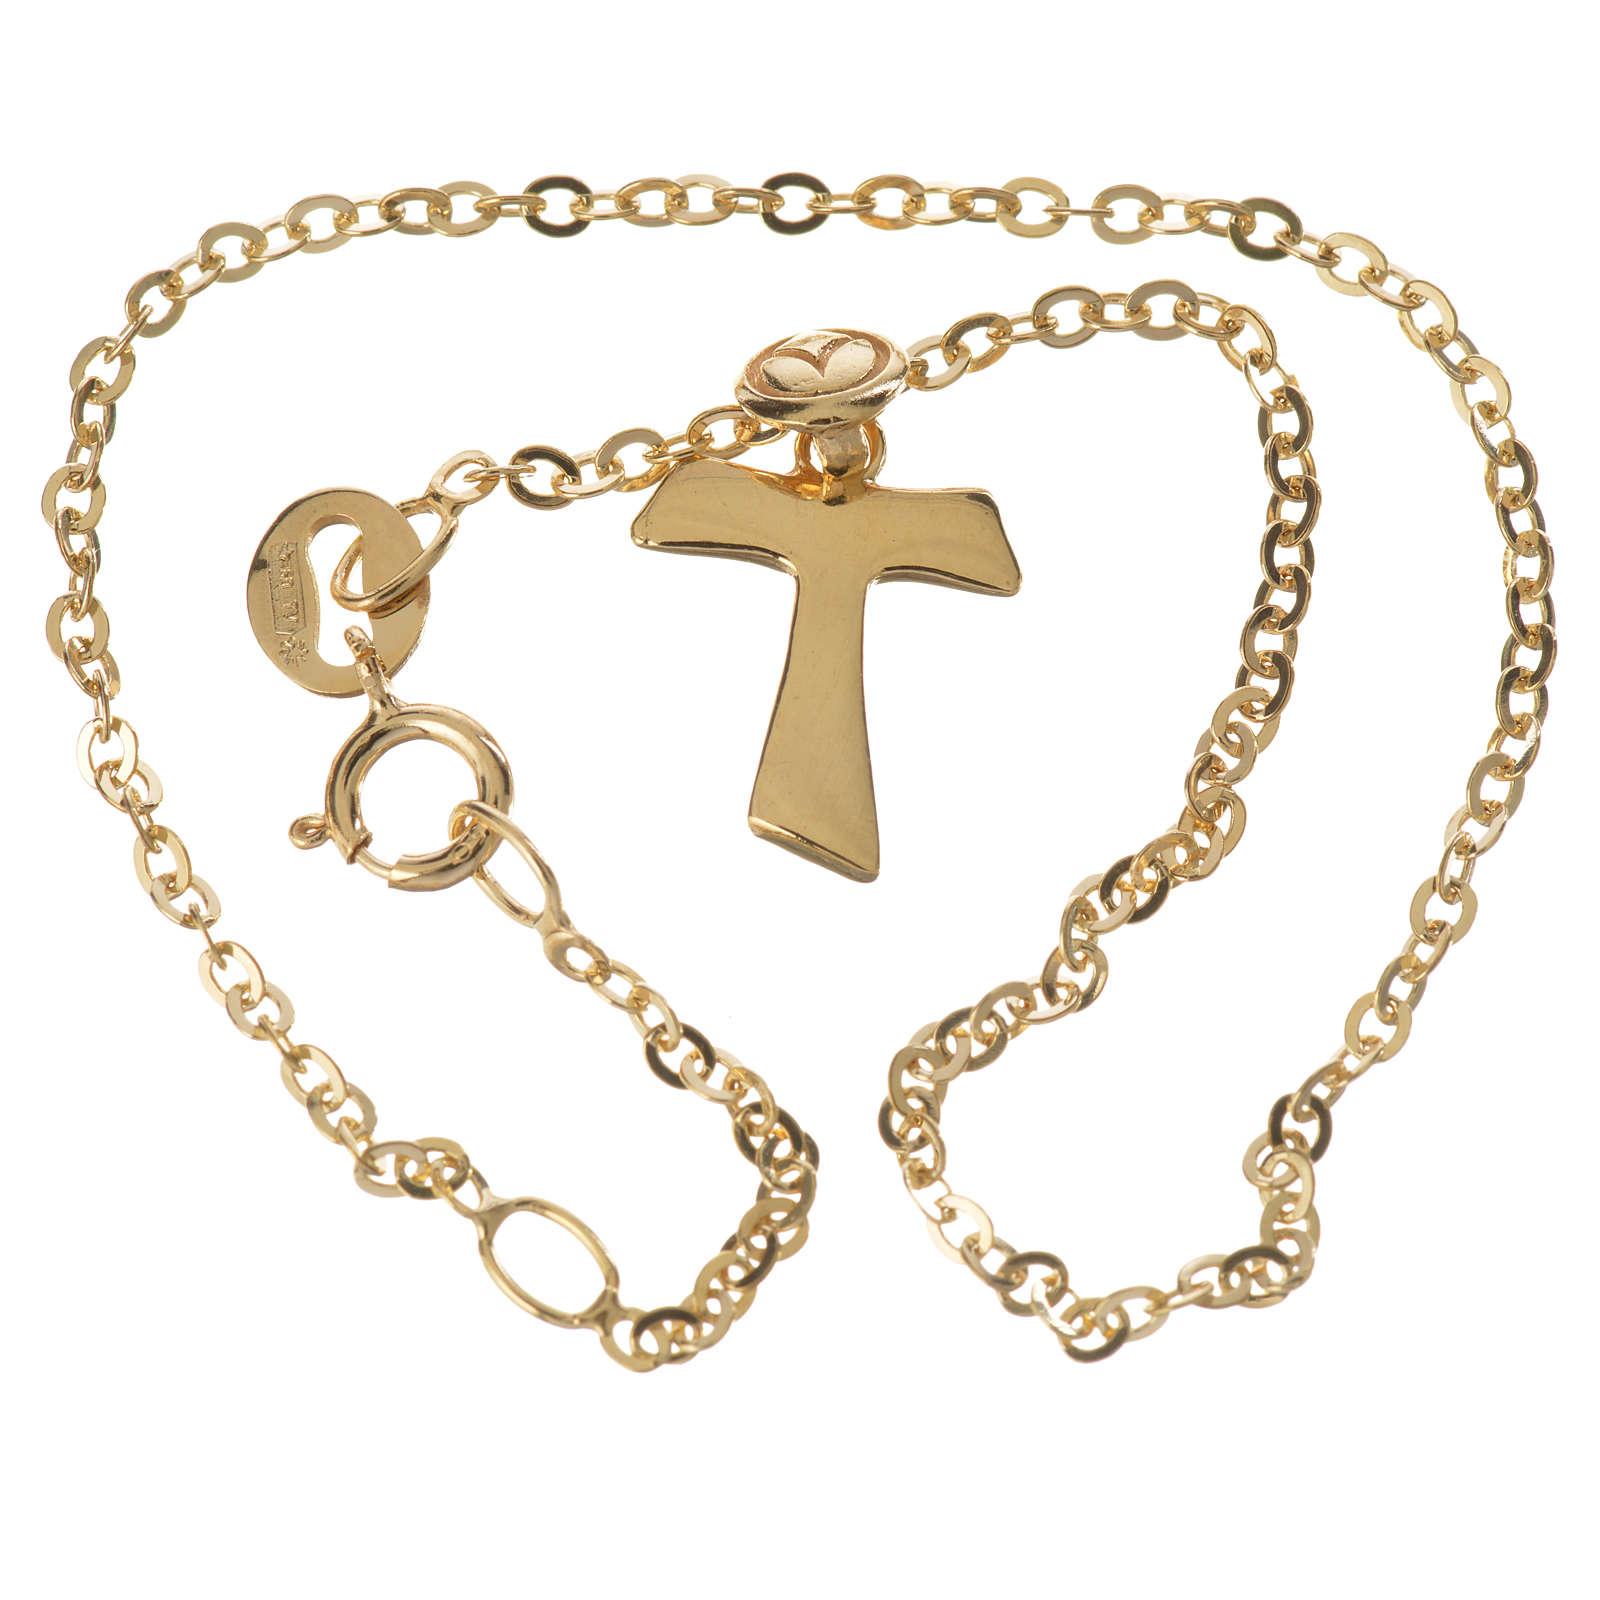 Bracelet avec tau en or 750/00 - 1,09 g 4